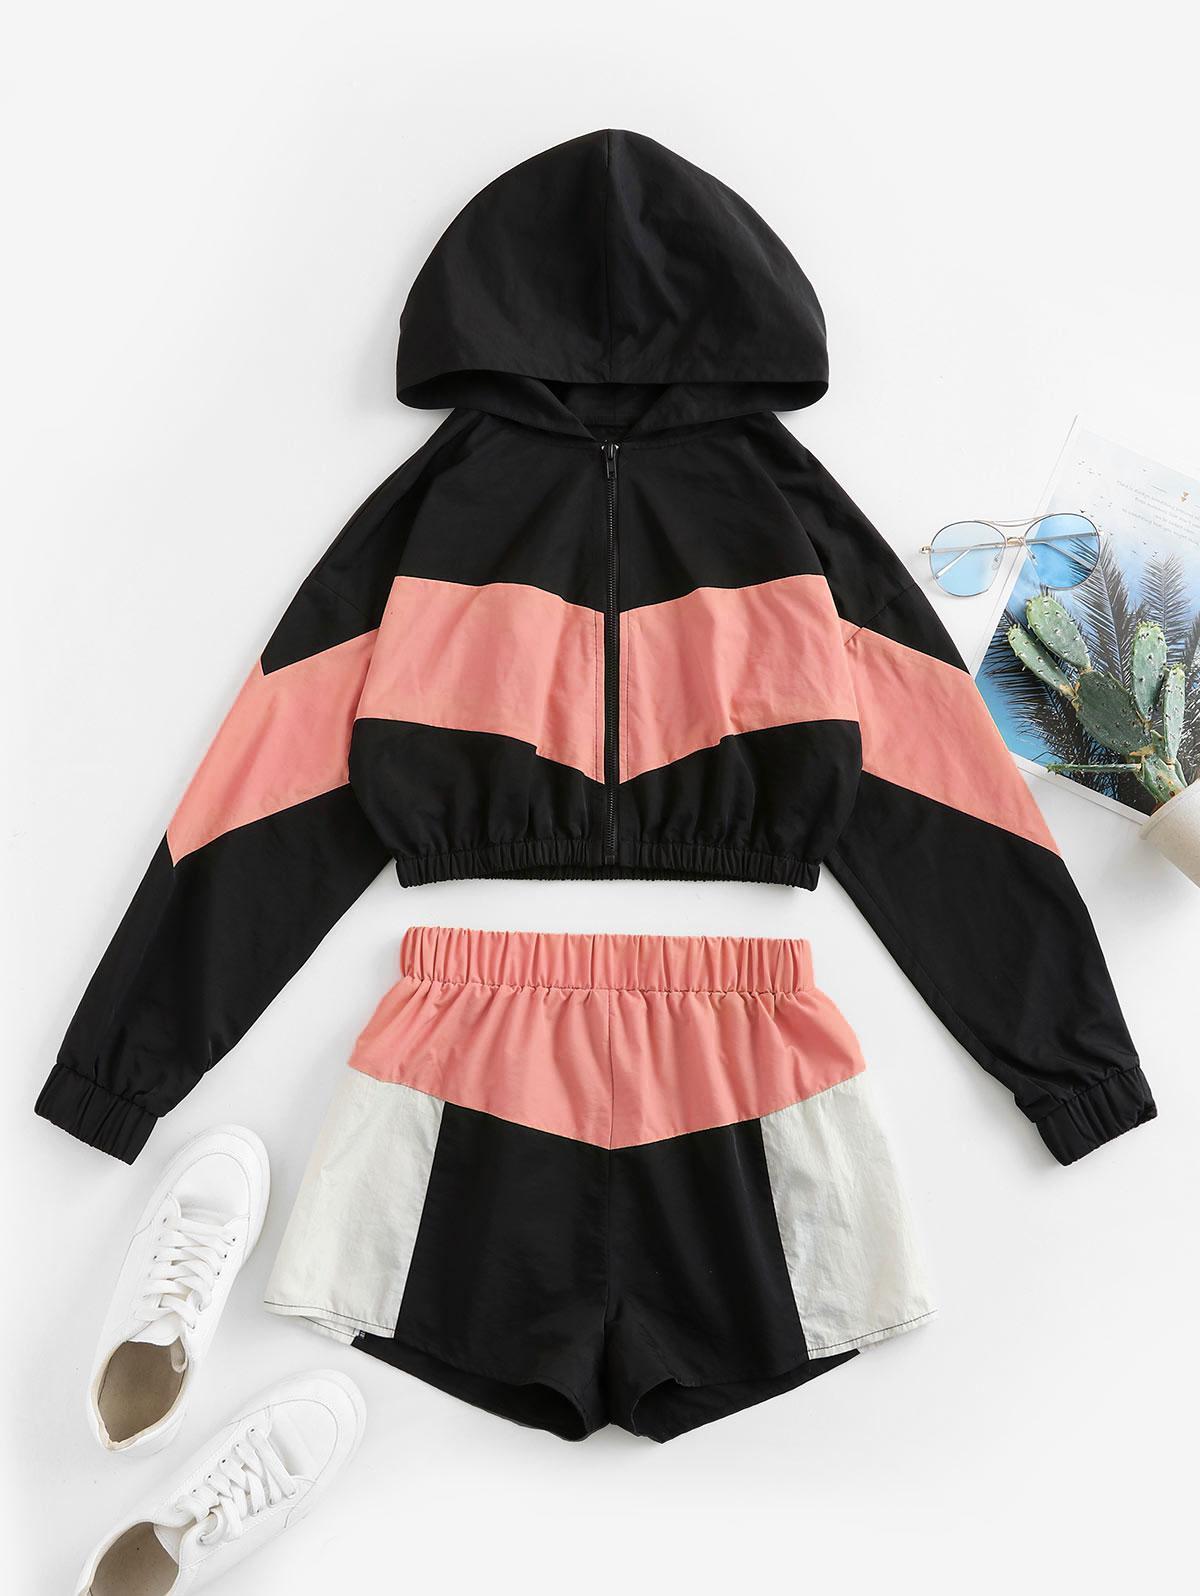 ZAFUL Colorblock Hooded Drop Shoulder Shorts Set, Multi-b